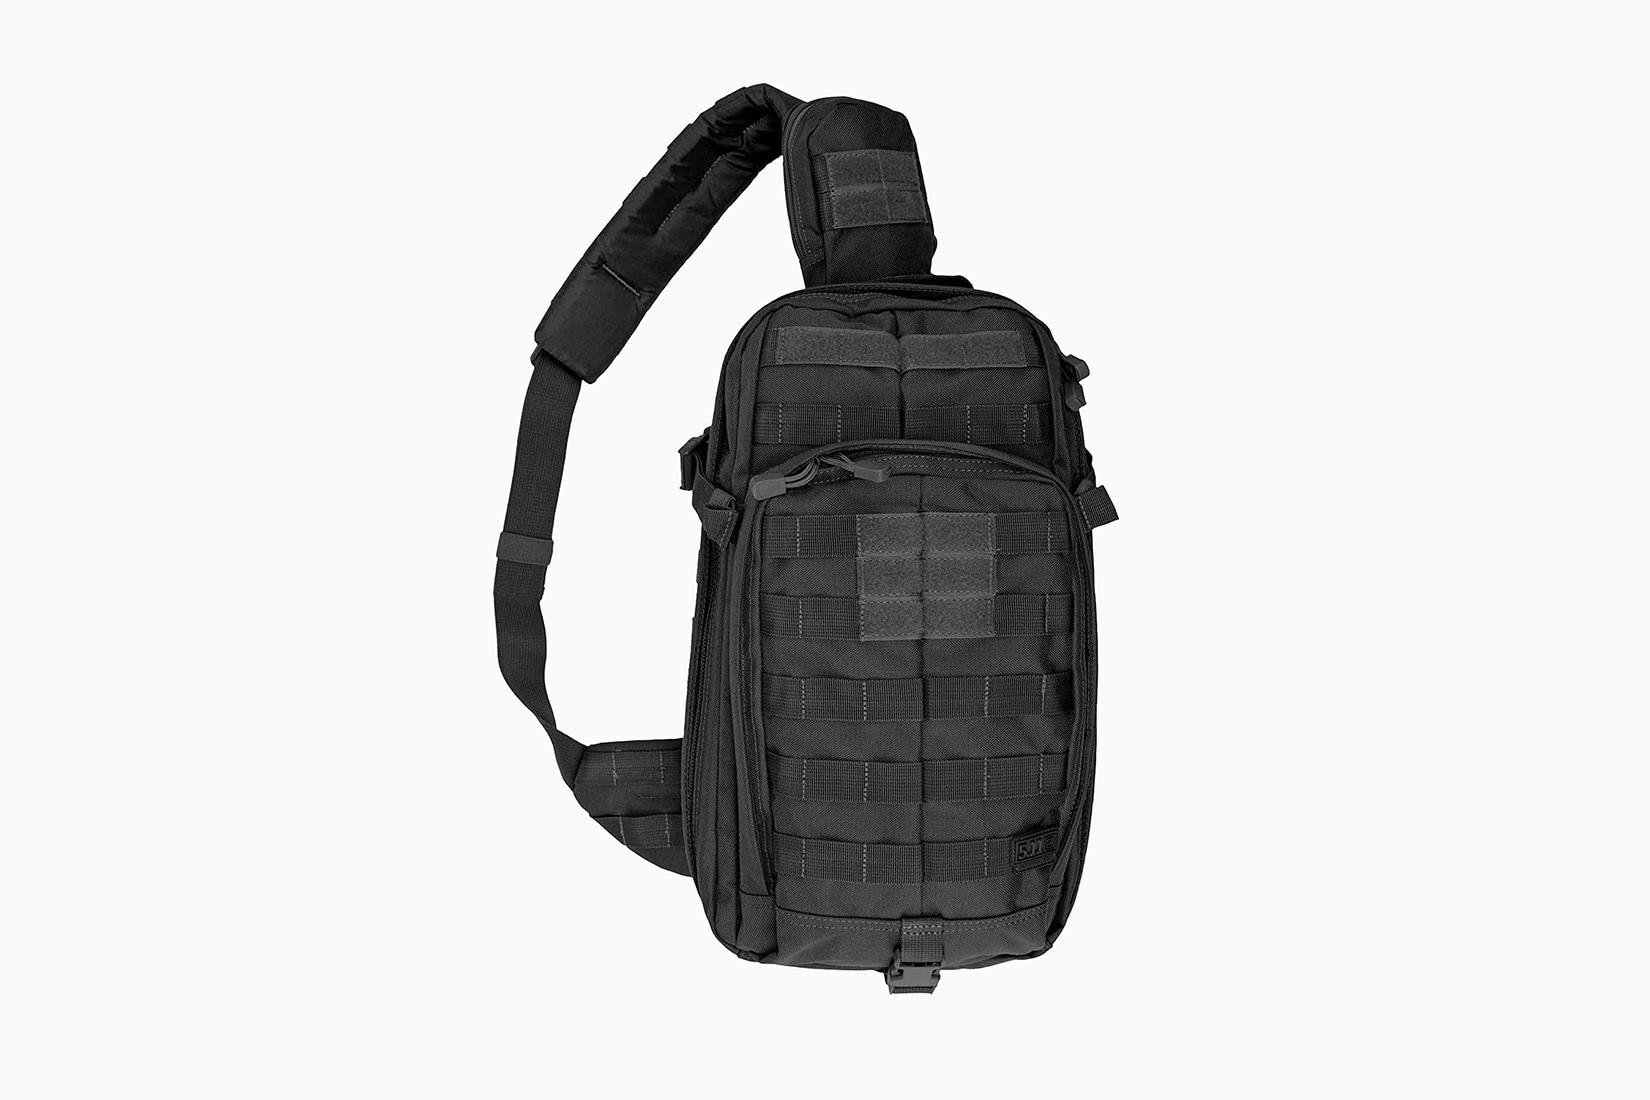 mejor bandolera 5.11 moab 10 tactical - Luxe Digital